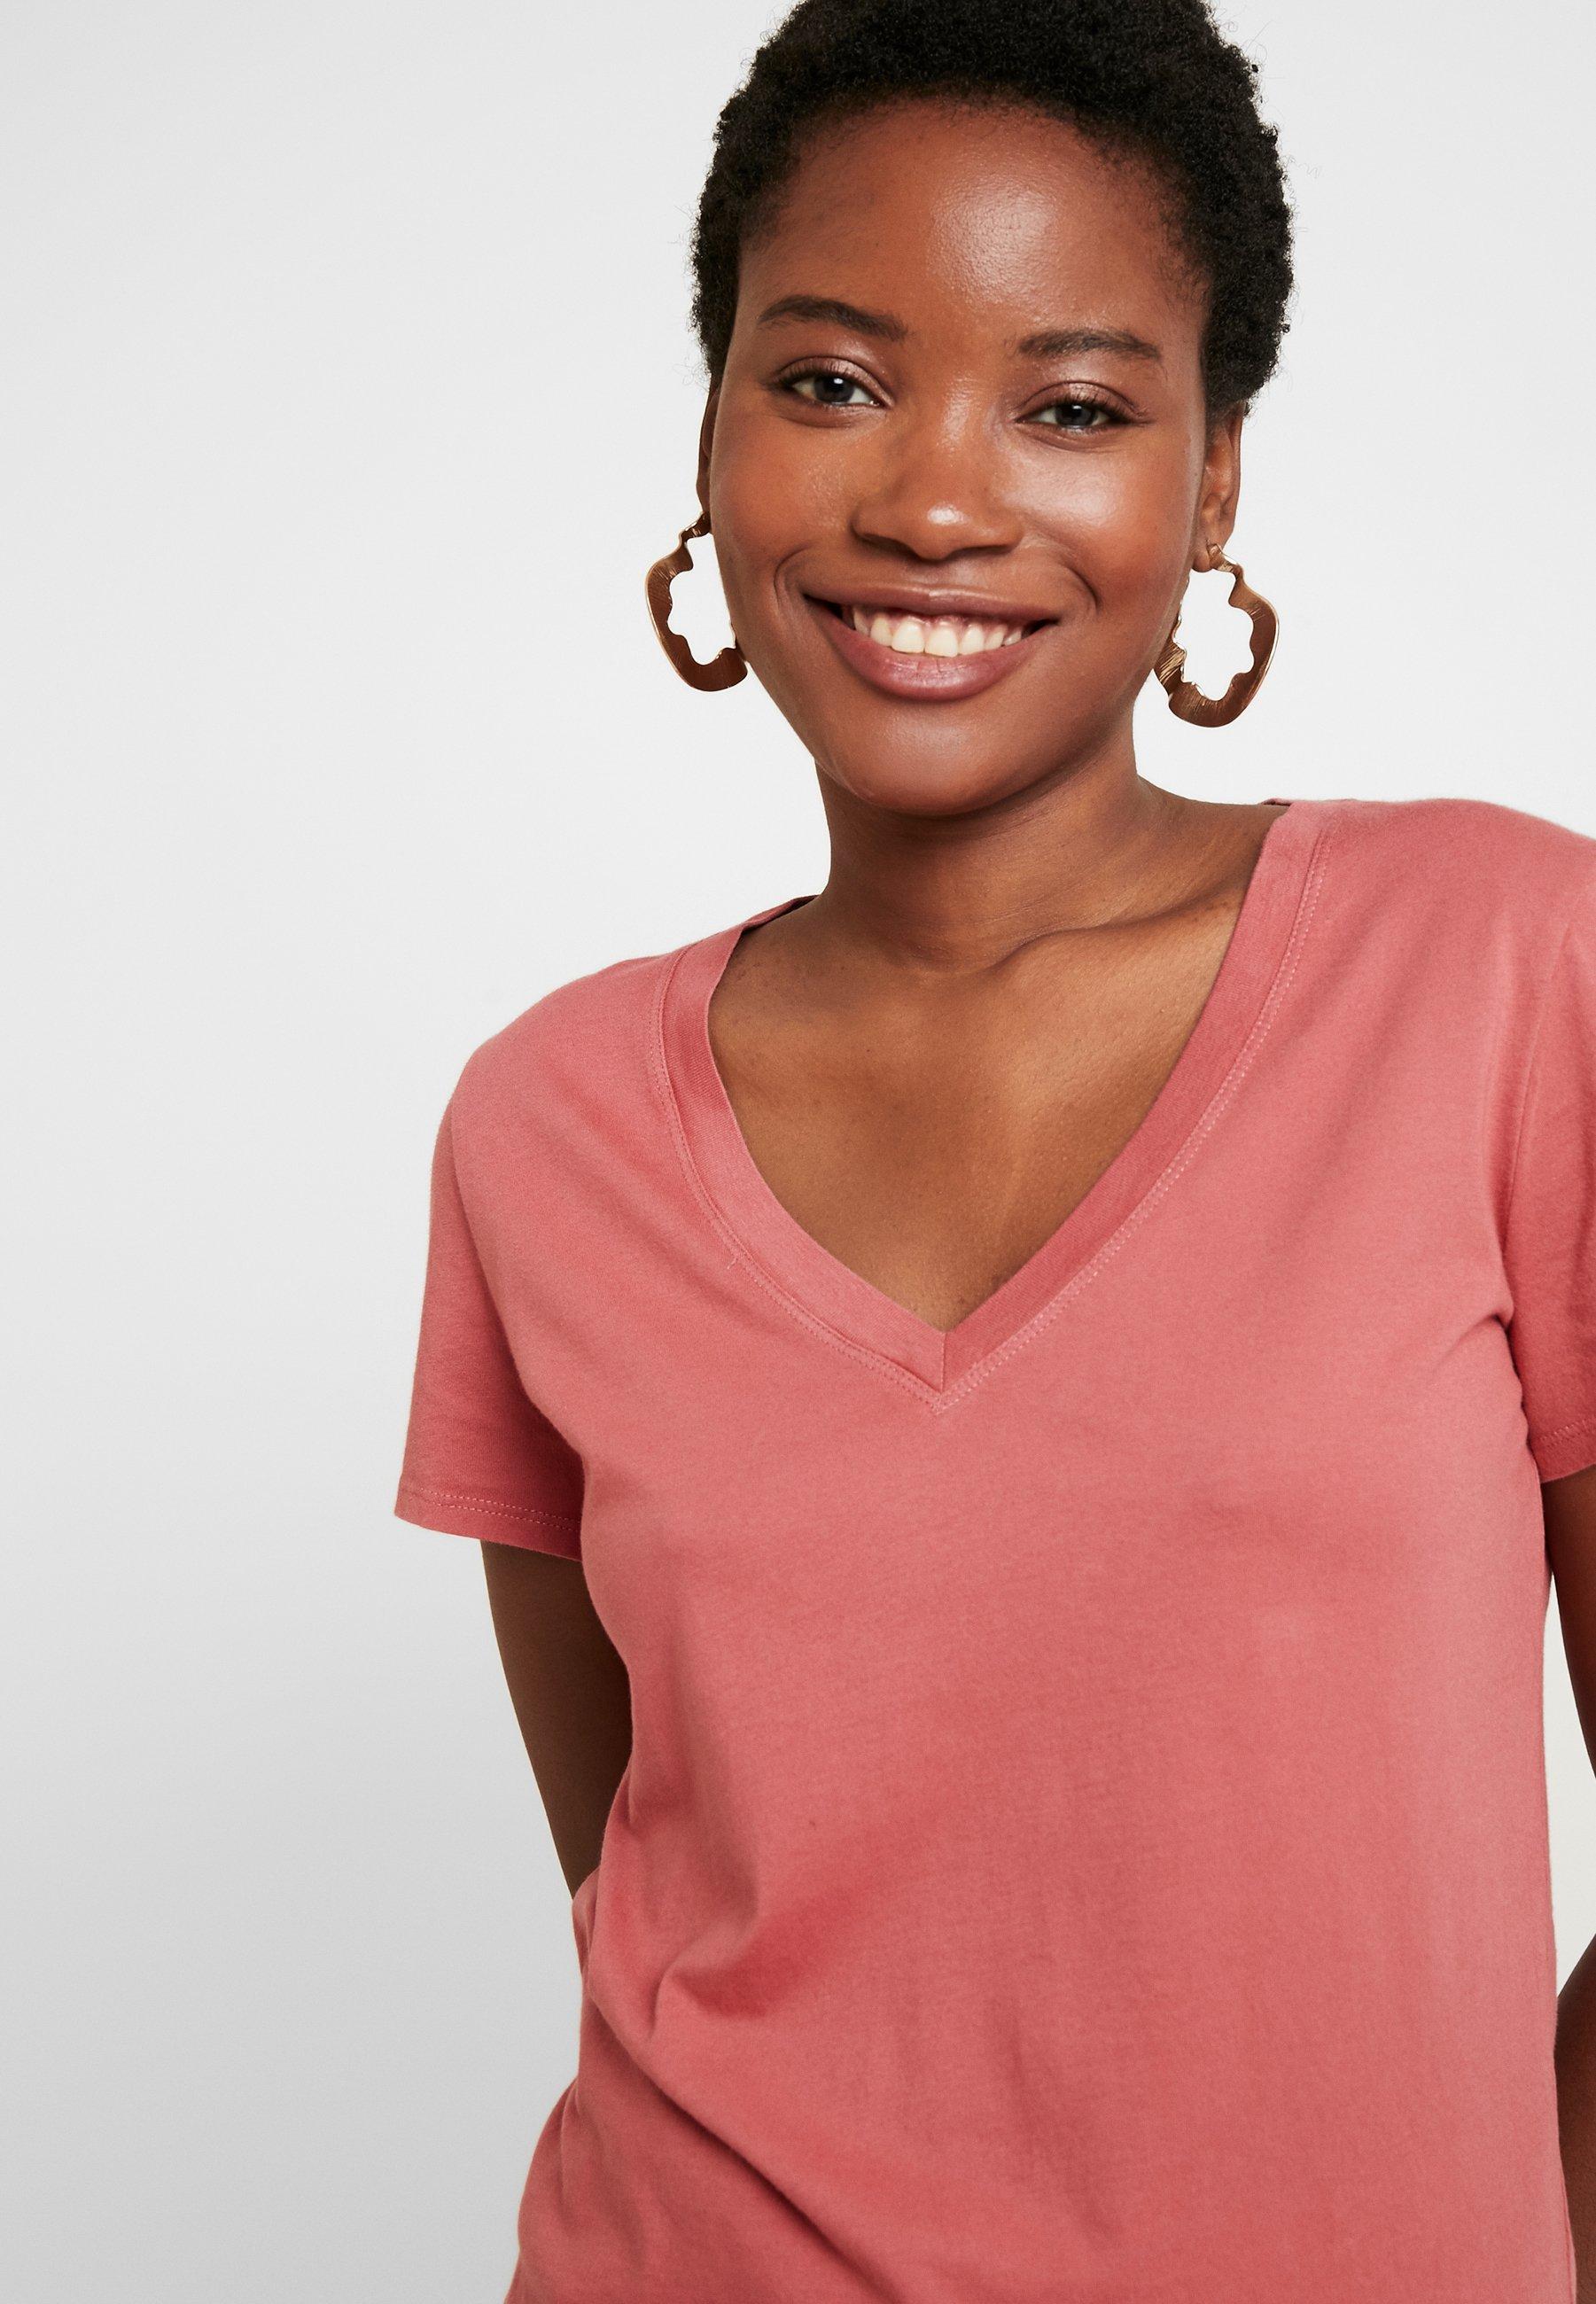 GAP T-shirts - terra cotta